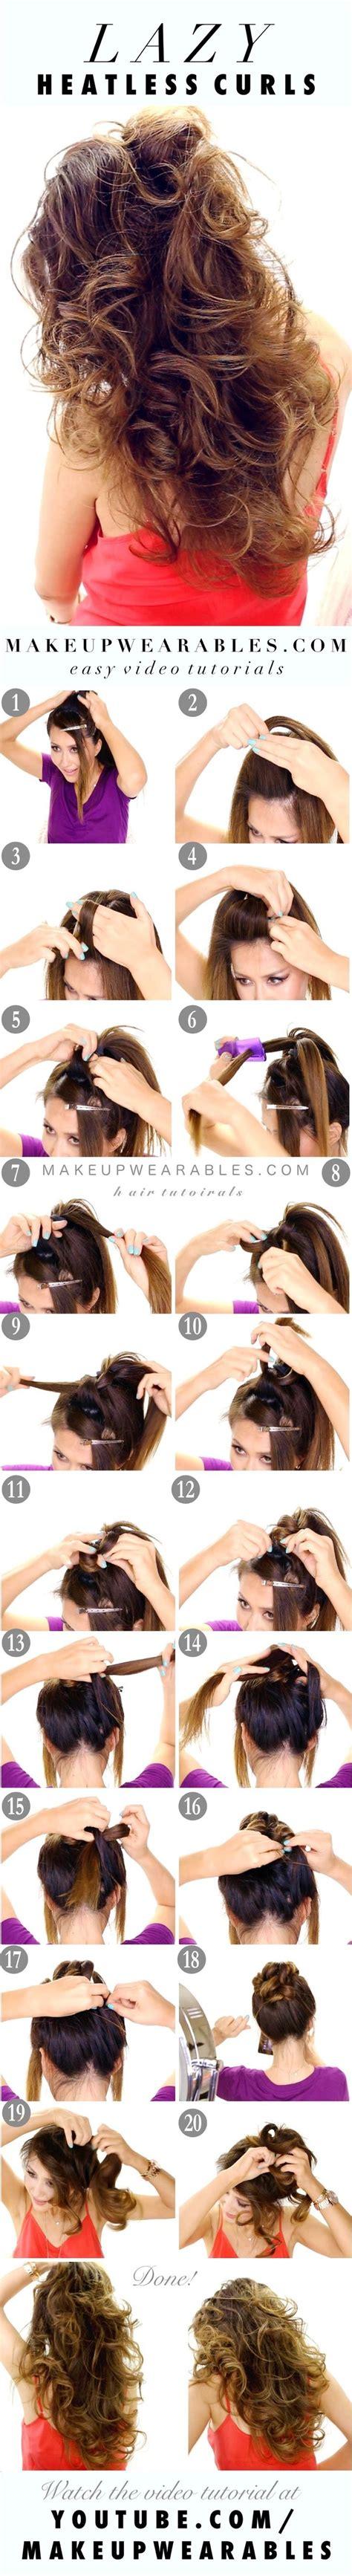 heatless hairstyles tutorials easy lazy heatless curls overnight no heat waves